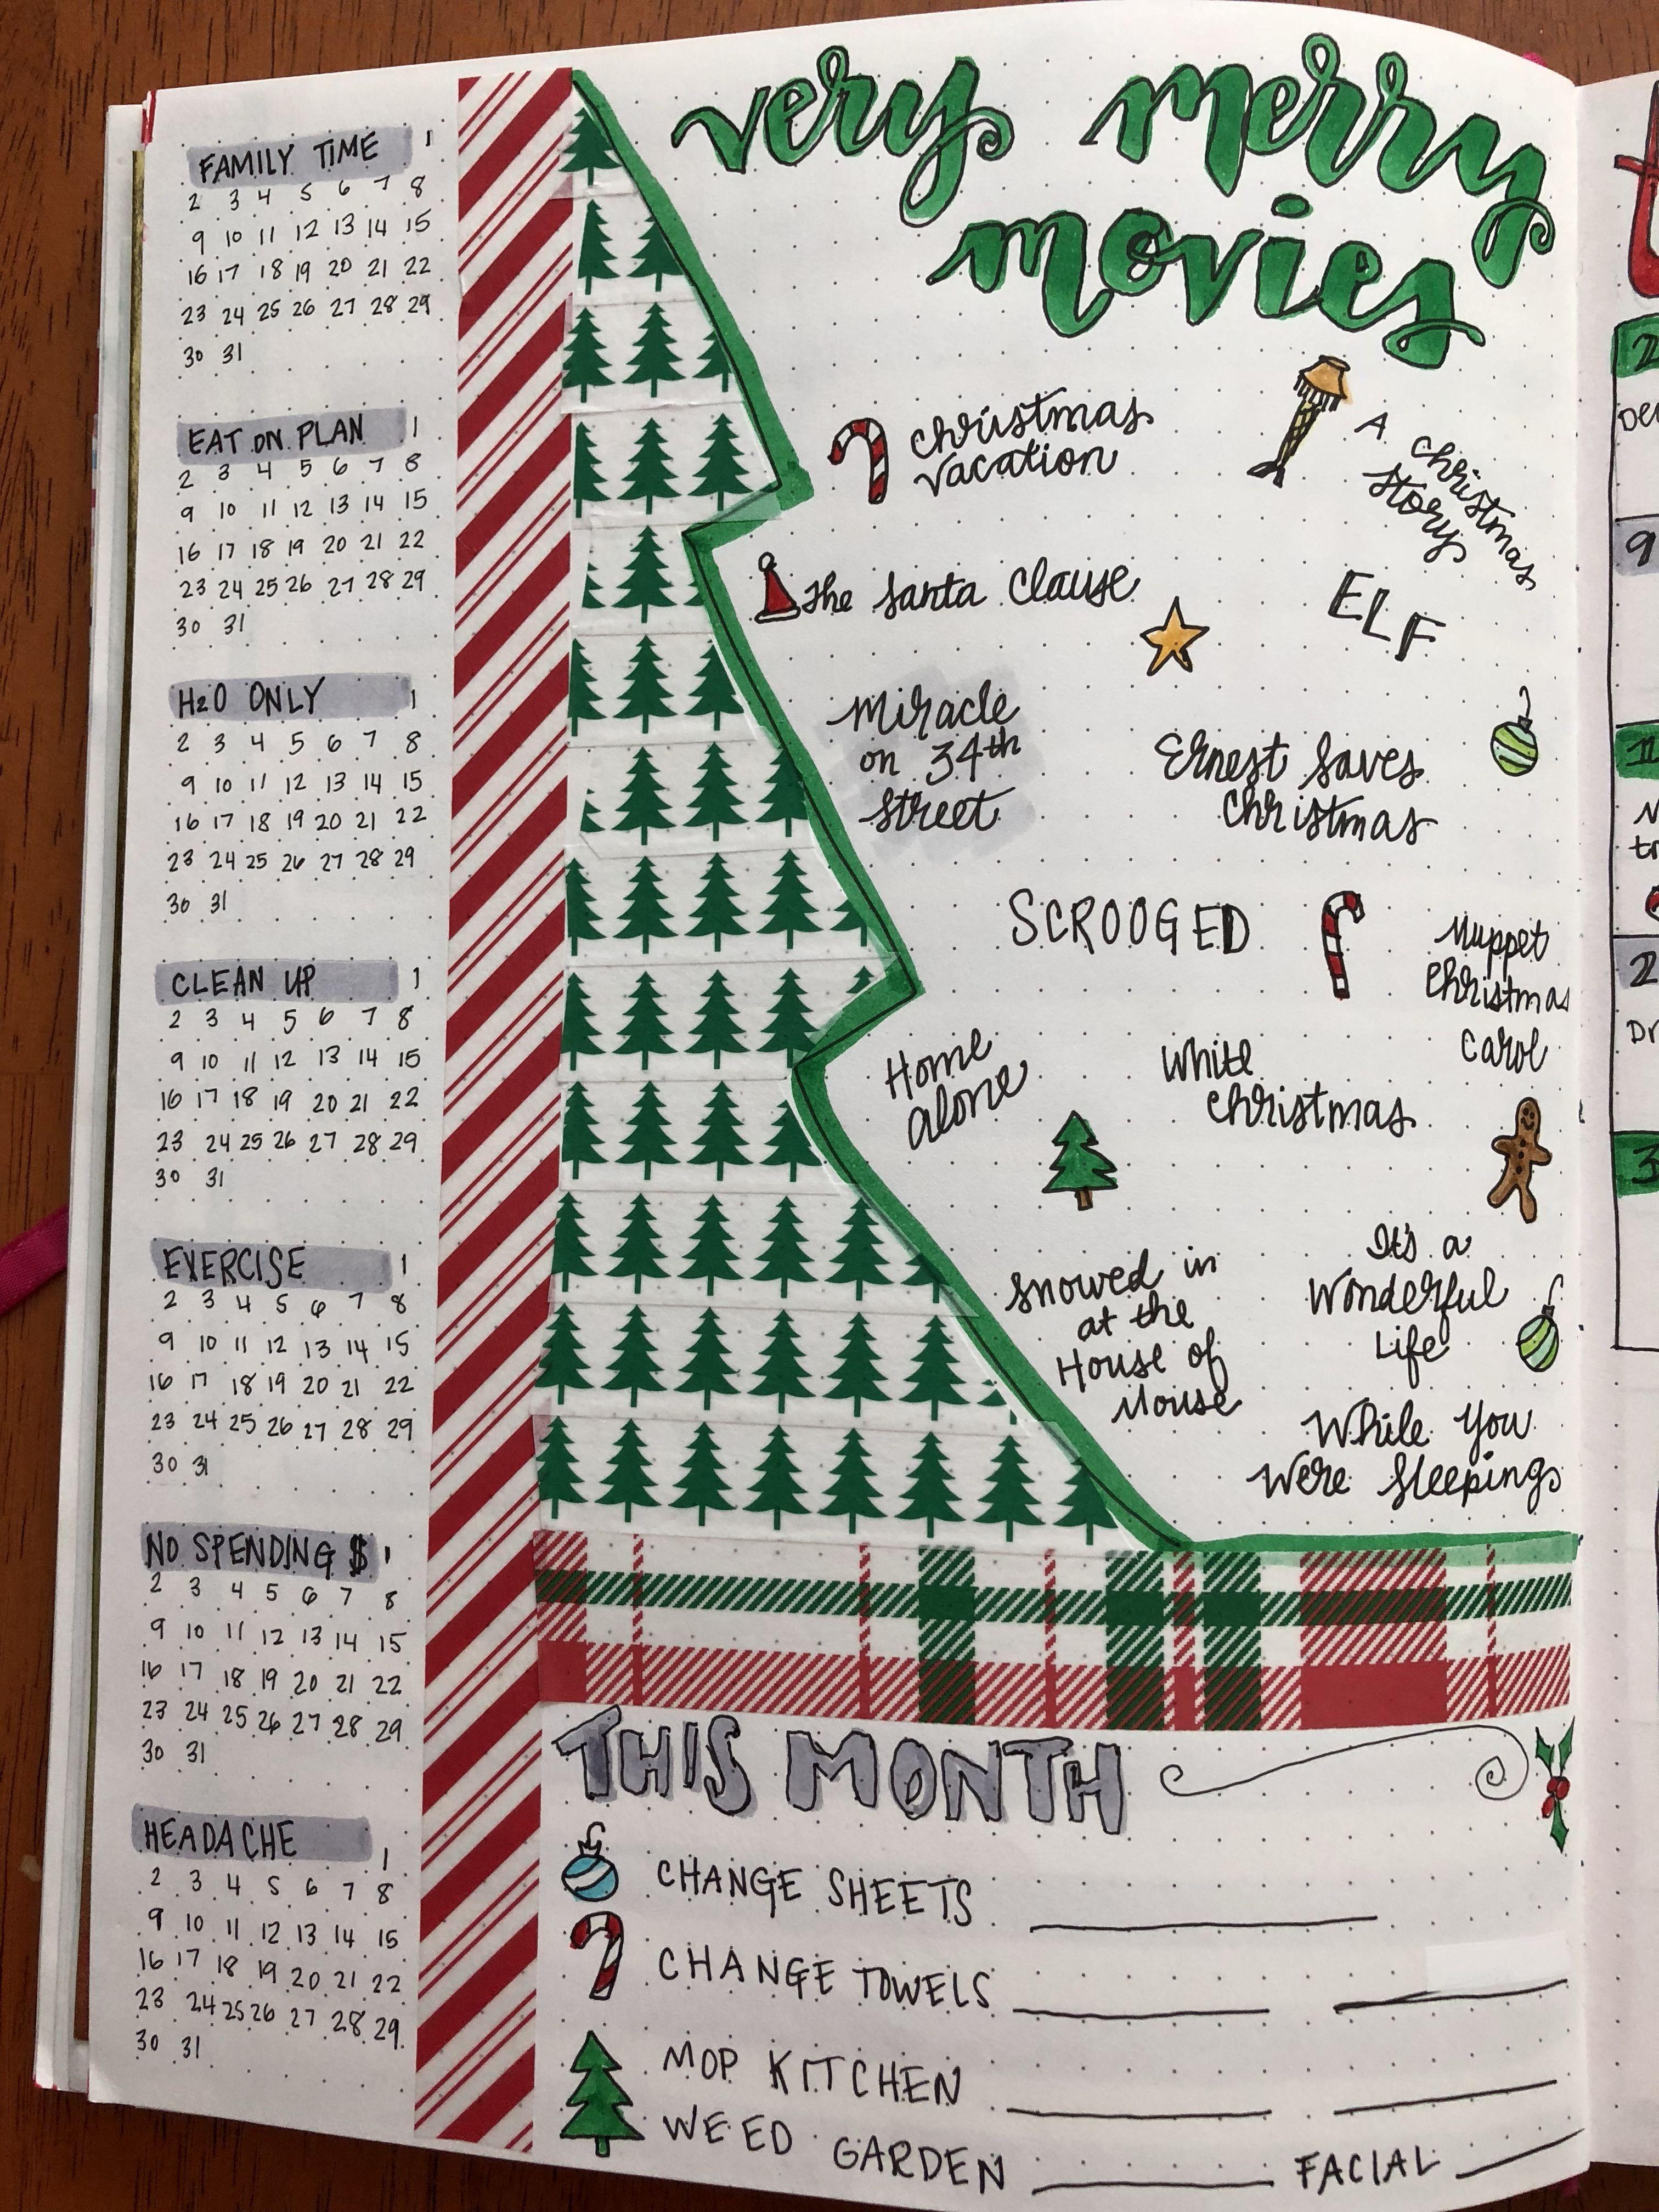 Calendarios para imprimir minimalista png 1990x1420 Calendario para imprimir